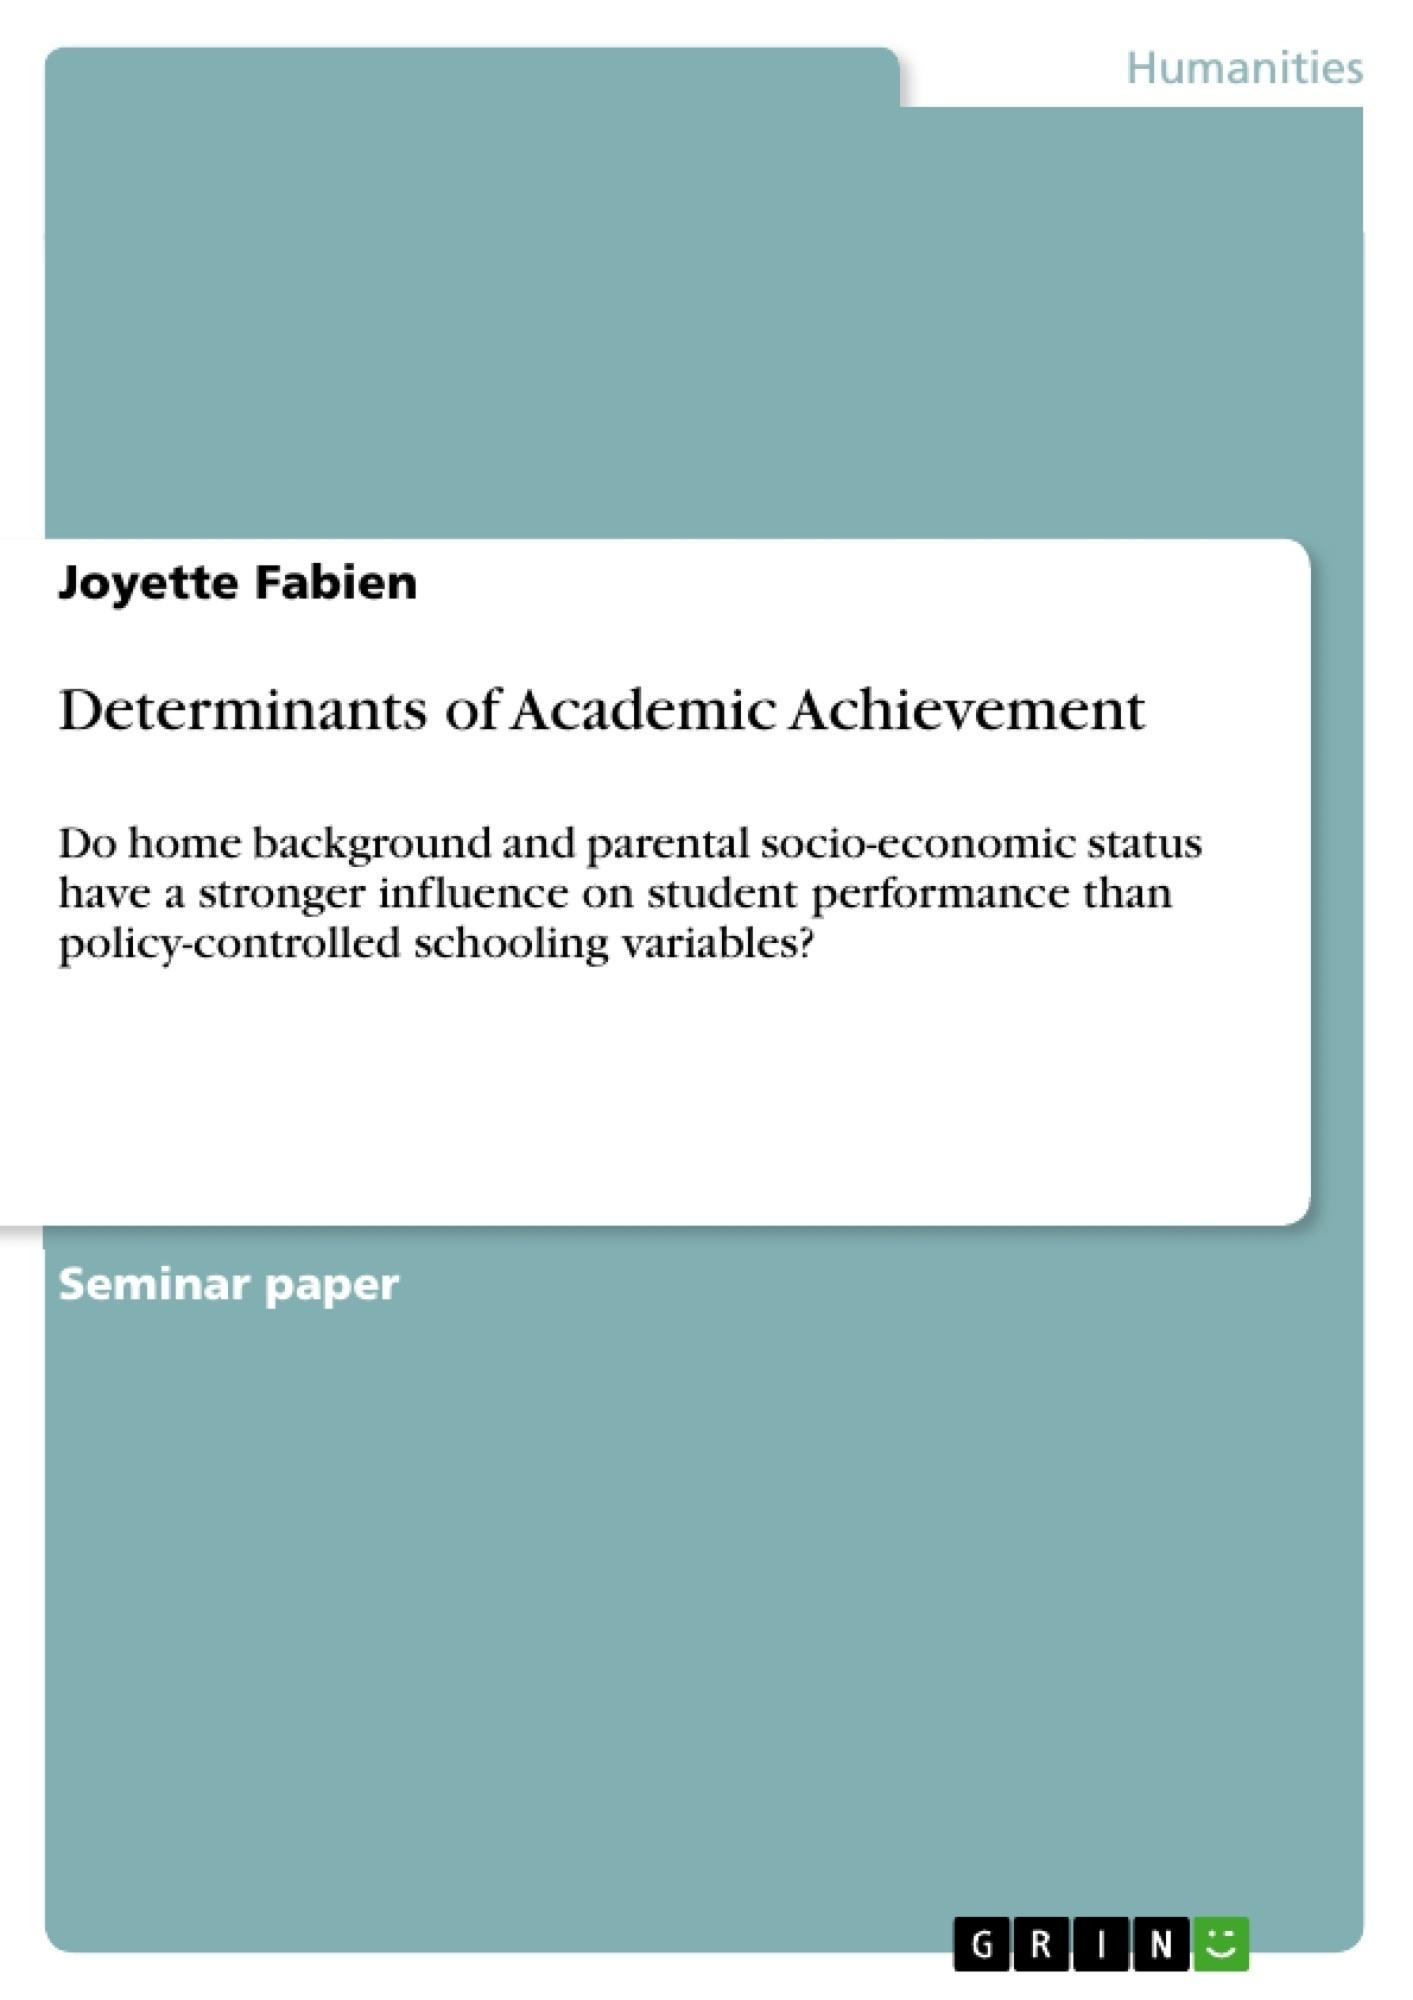 Title: Determinants of Academic Achievement